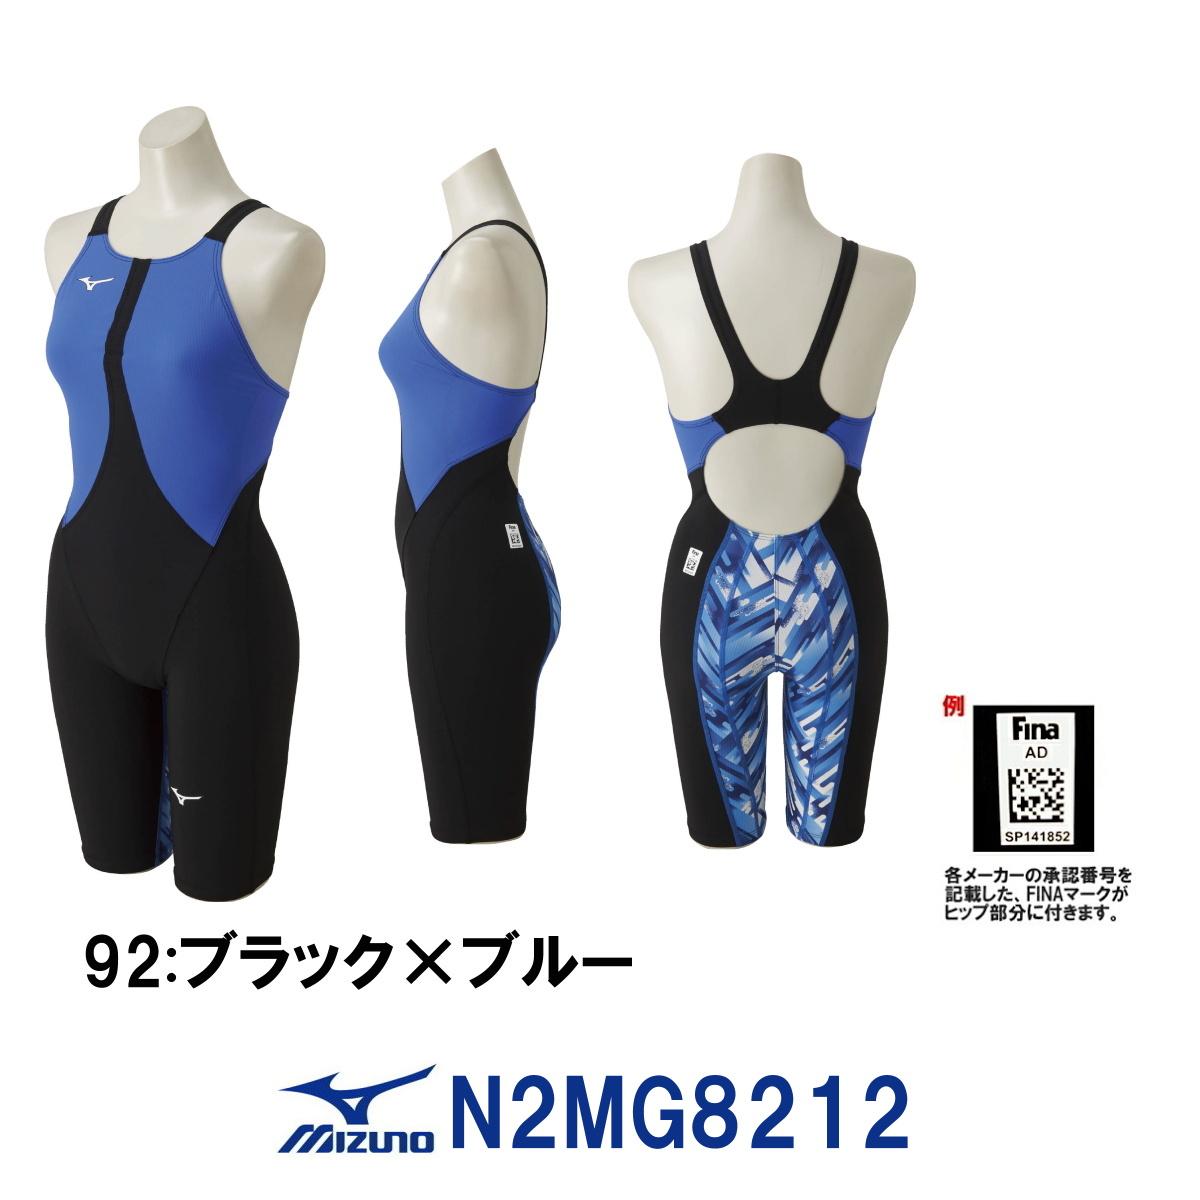 MIZUNO ミズノ 競泳水着 レディース fina承認 スイムウェア スイミング ハーフスーツ MX・SONIC02 霞×BLUE ブルー SONIC LIGHT-RIBTEX 2018年SSモデル N2MG8212